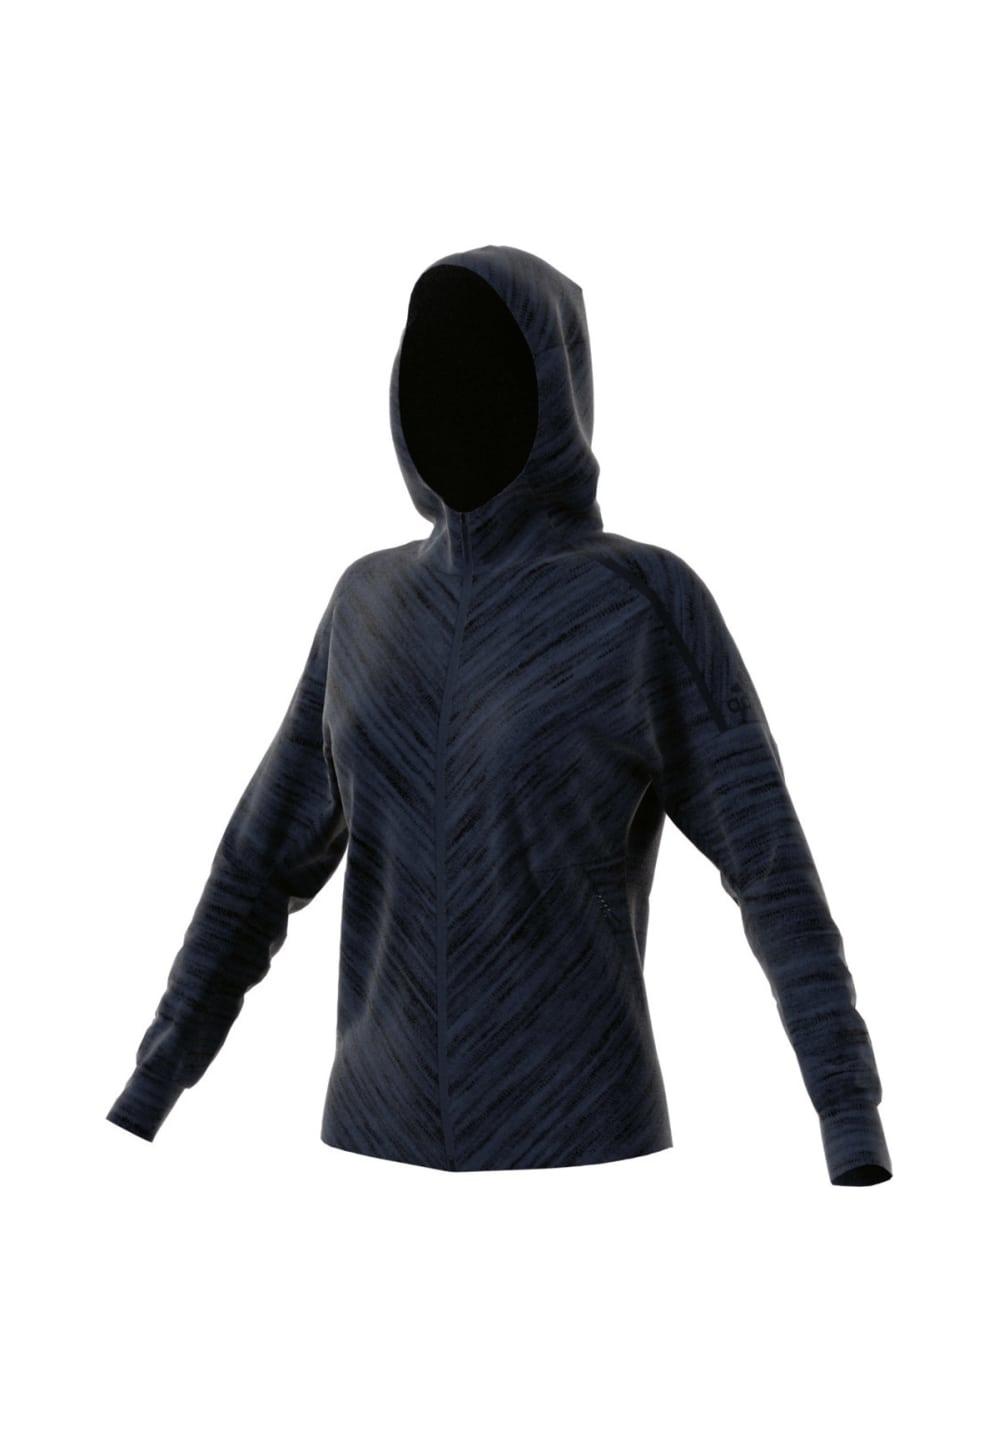 adidas ZNE Roadtr Hood - Sweatshirts & Hoodies für Damen - Blau, Gr. XS